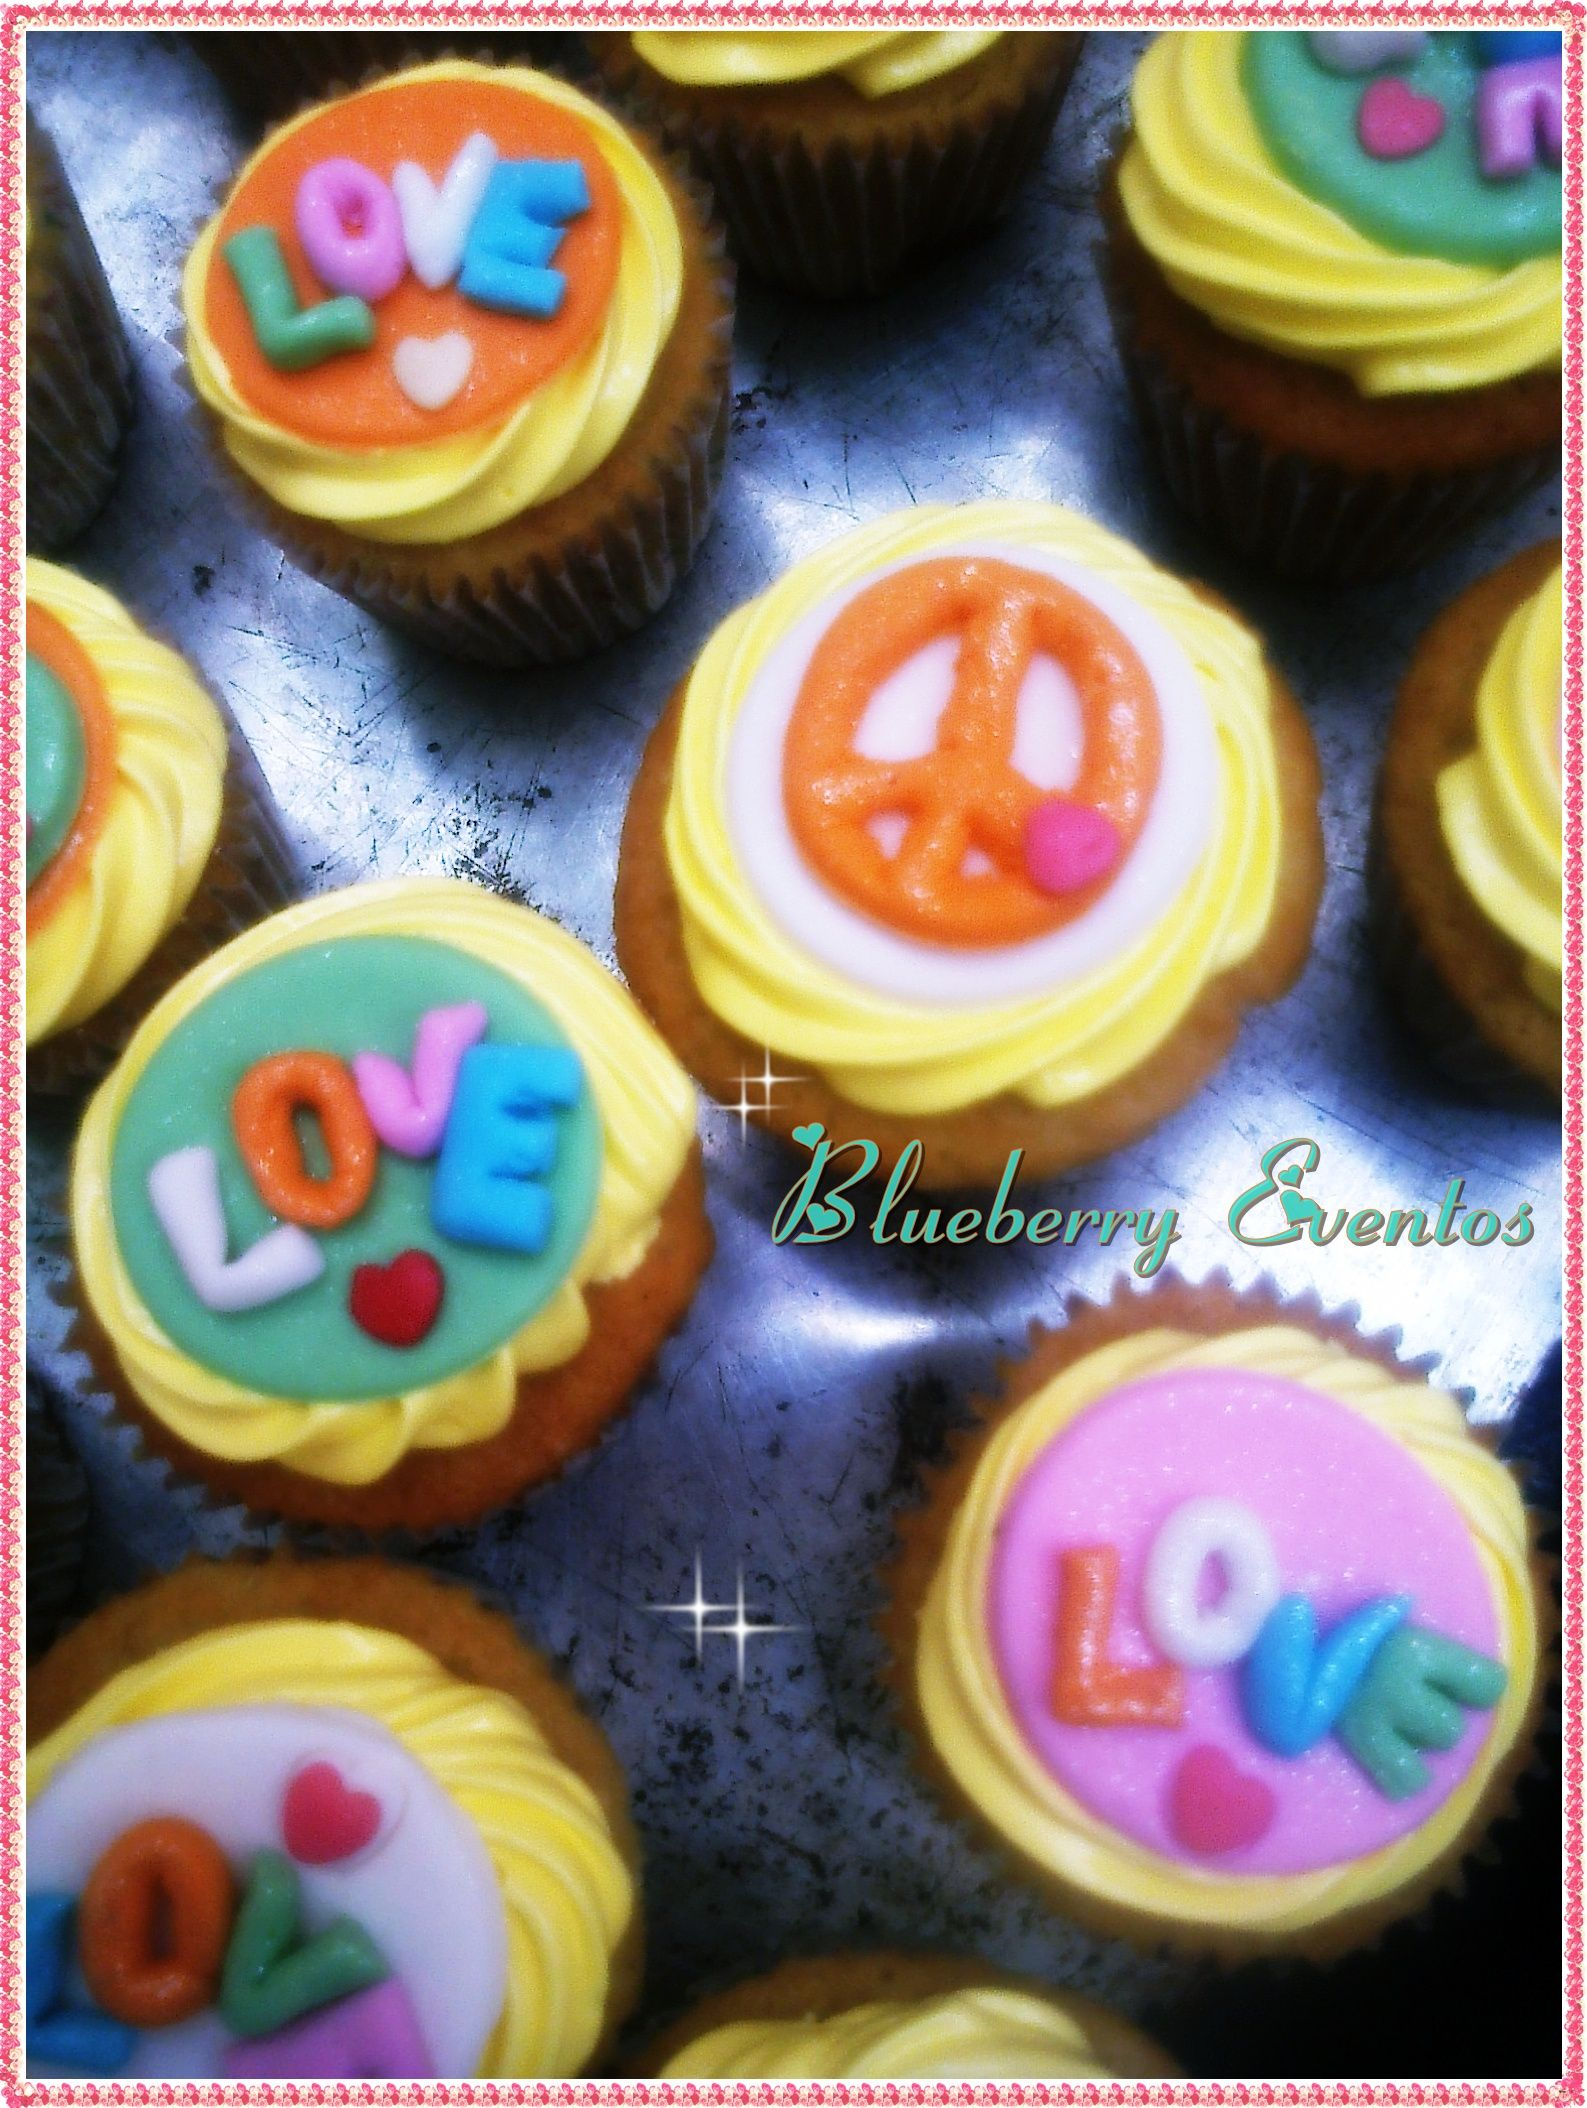 Cupcakes Peace & Love Blueberry Eventos